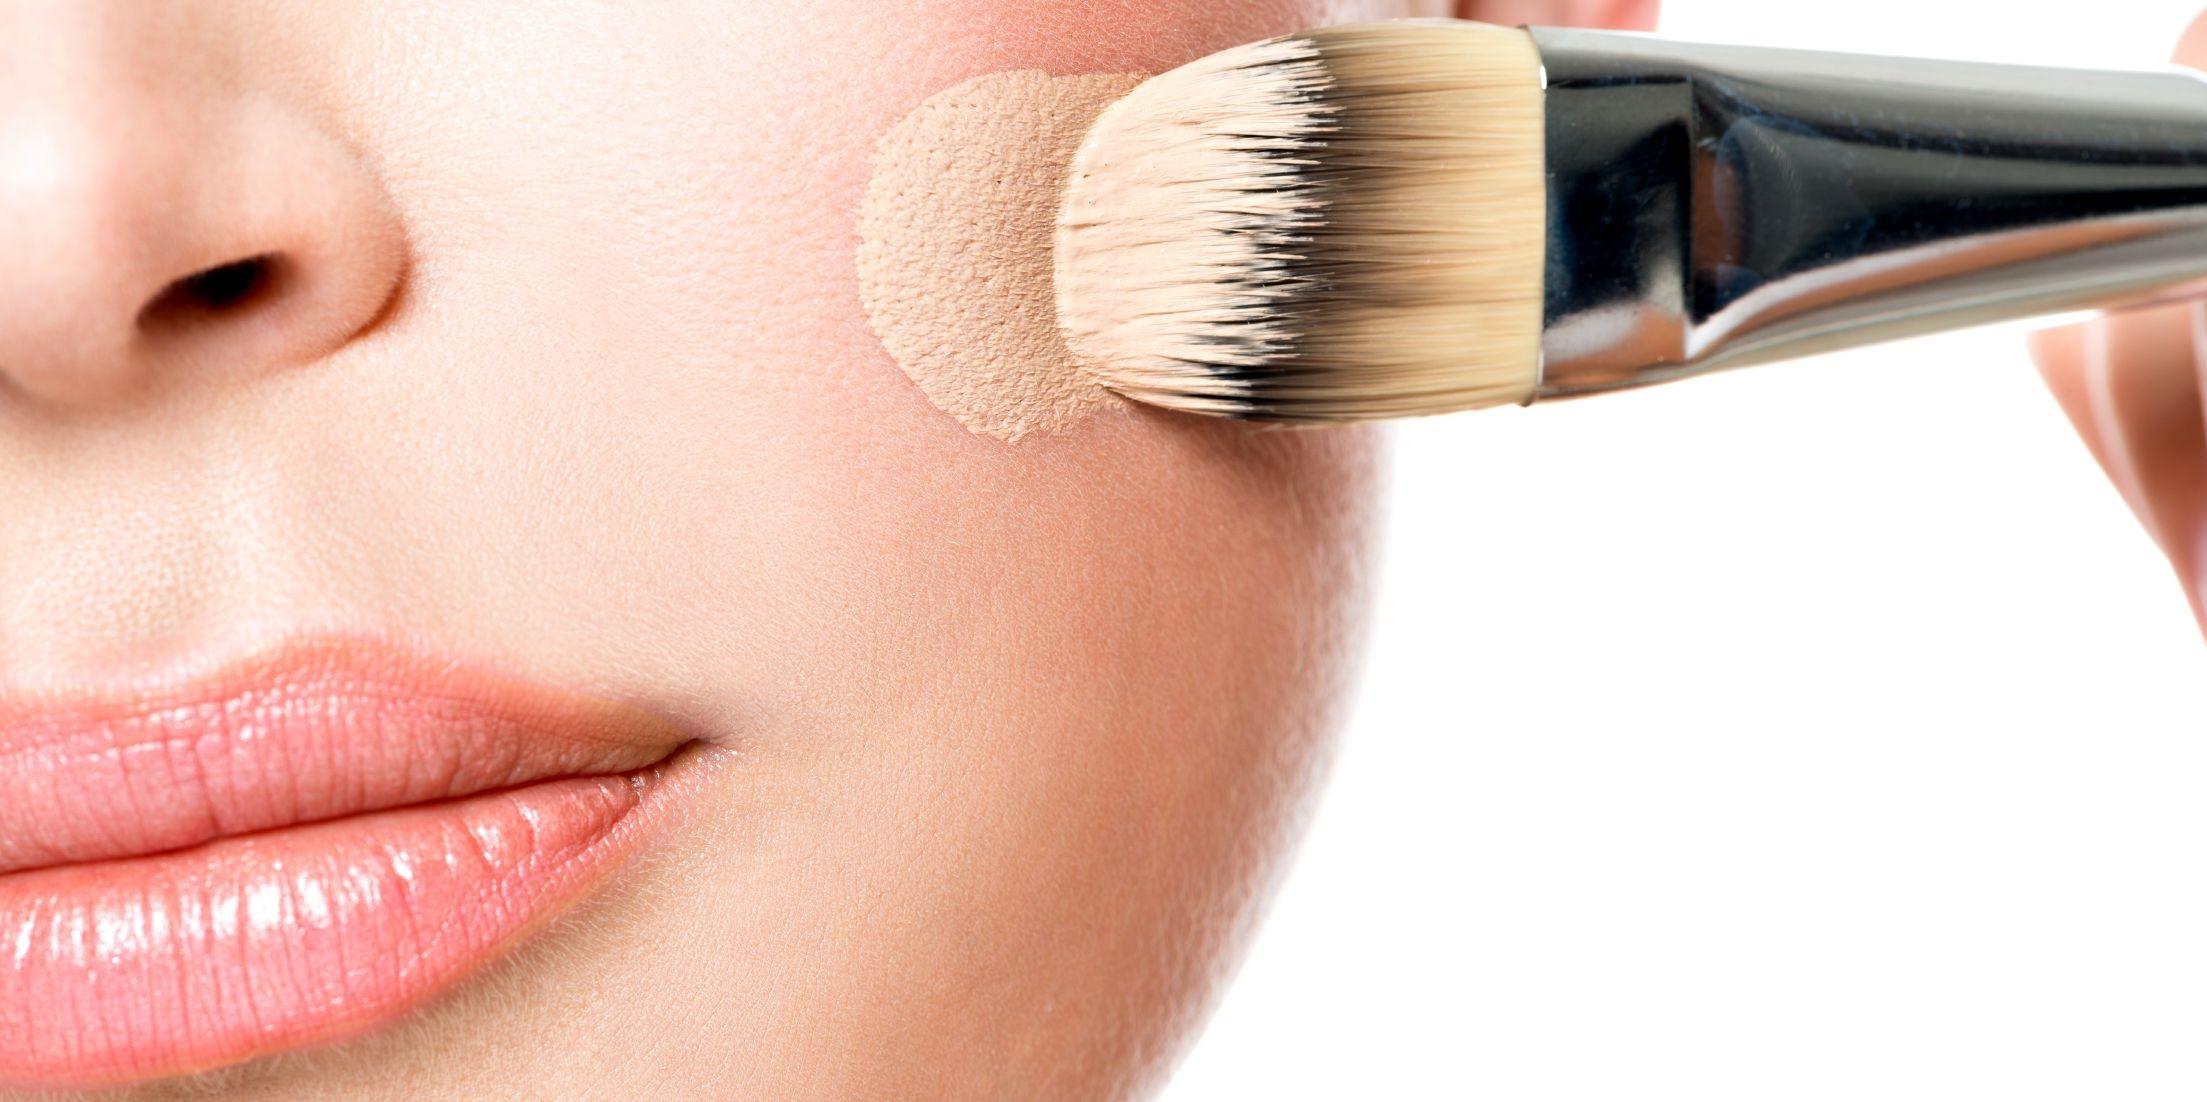 https://cdn.alza.cz/Foto/ImgGalery/Image/Article/make-up-jak-vybrat.jpg